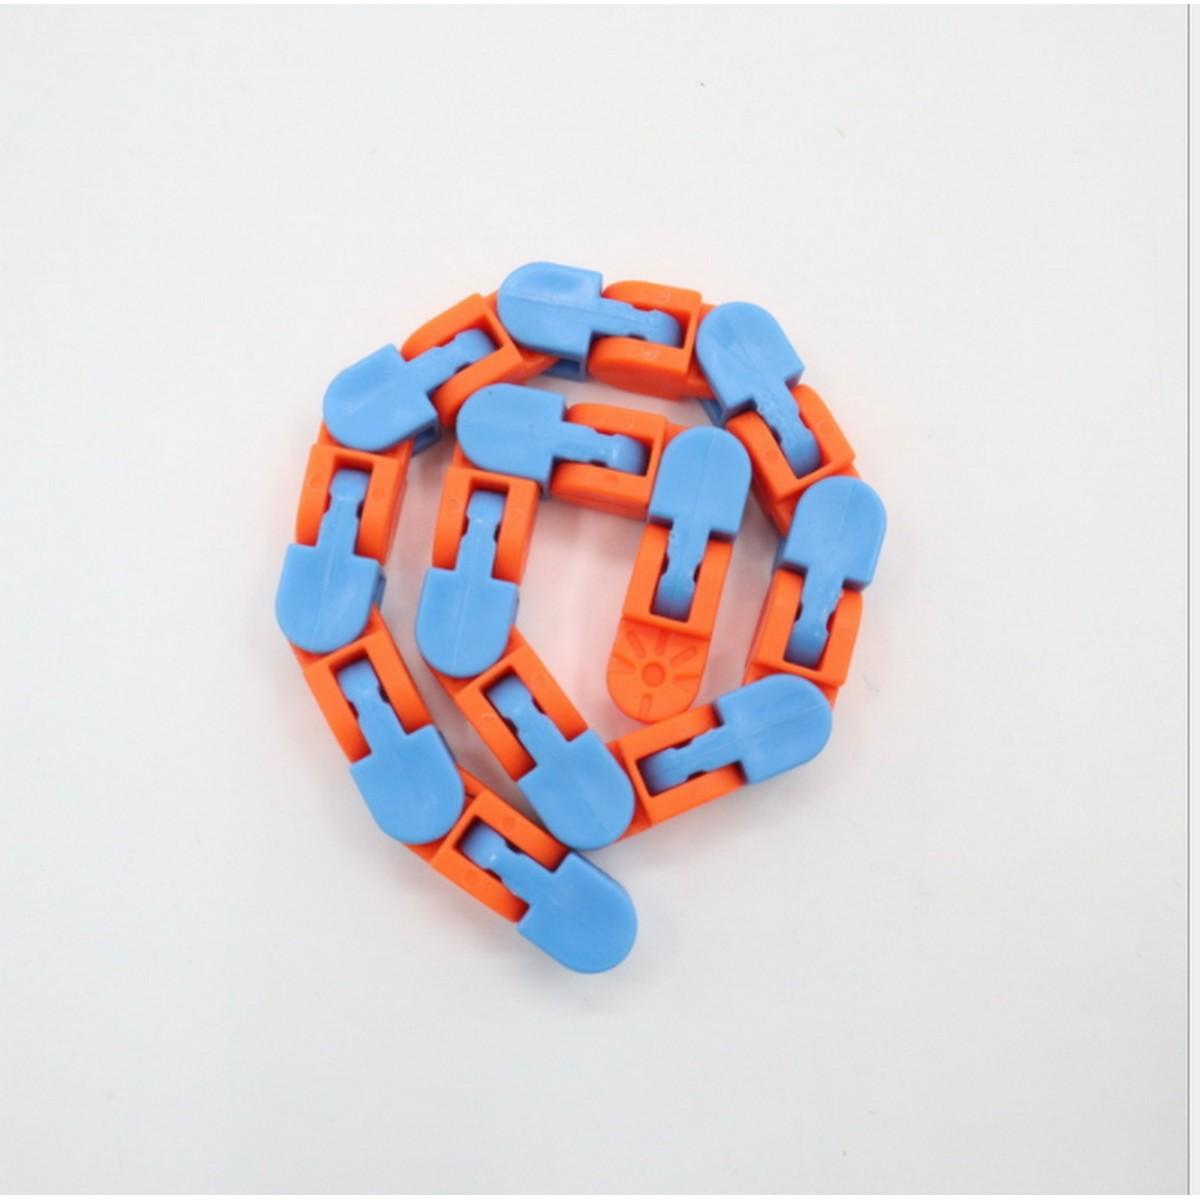 Kids DIY Snake Puzzles Fidget Toys Snap and Click Sensory Toy Autism Stress Reliever 24 Links Wacky Track Fidget Toy